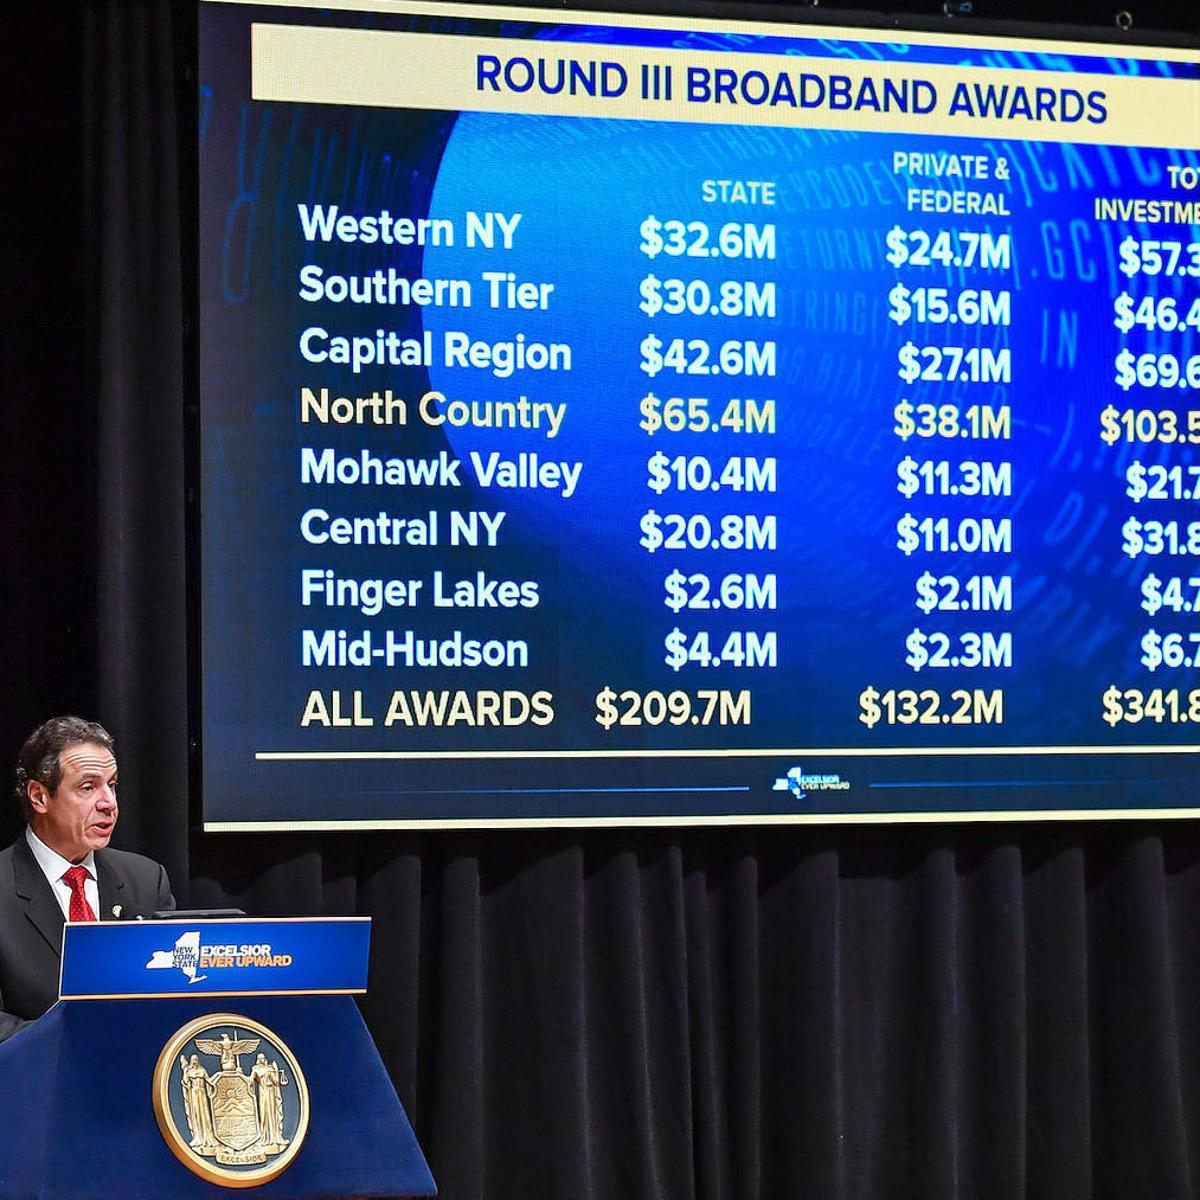 Some Washington County residents wondering when broadband